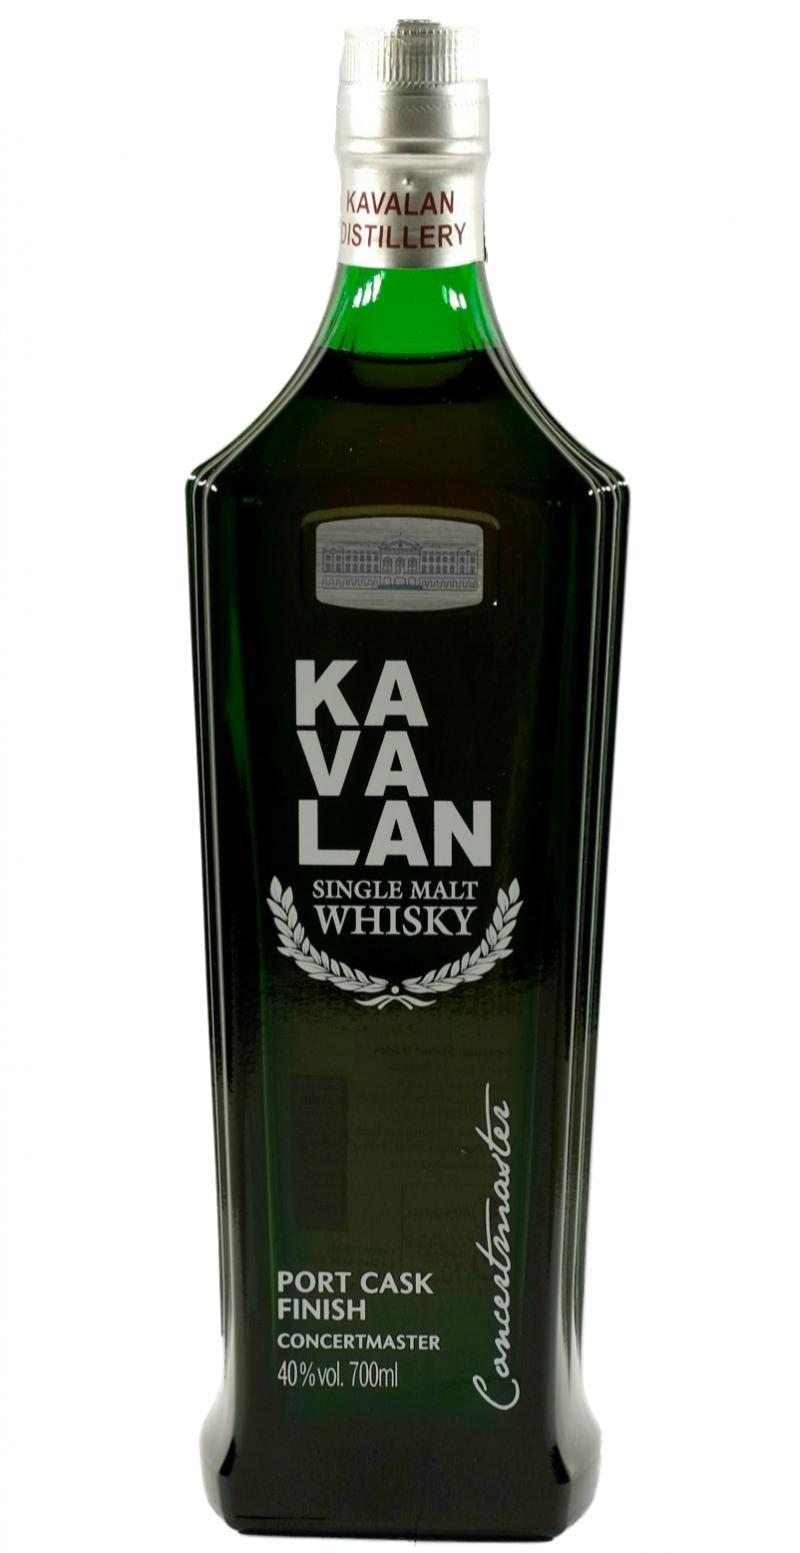 Kavalan Concertmaster